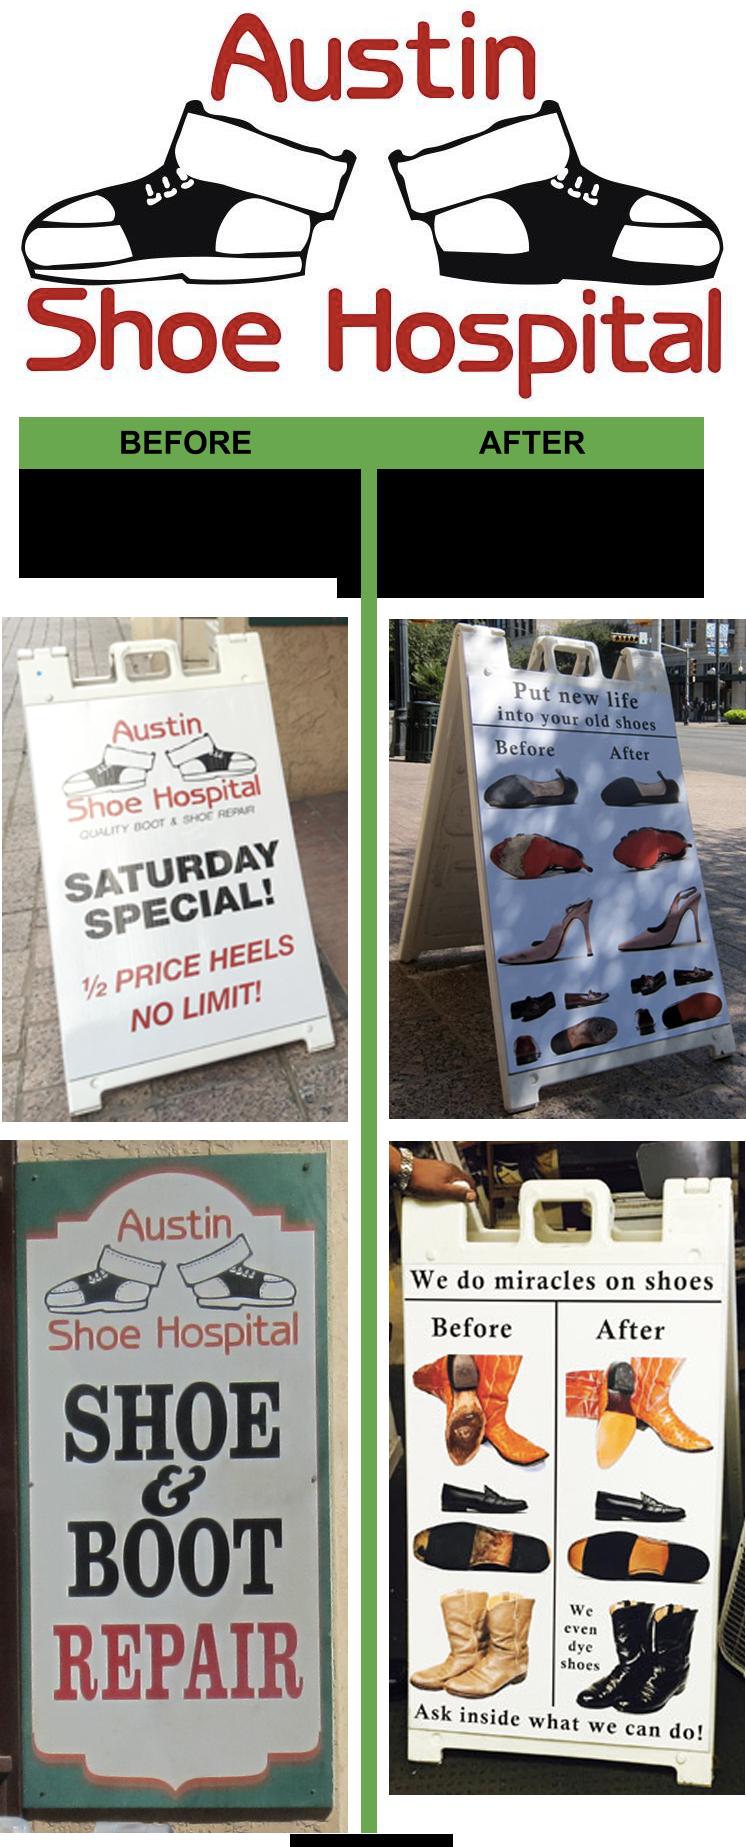 Shoe shop street advertising example